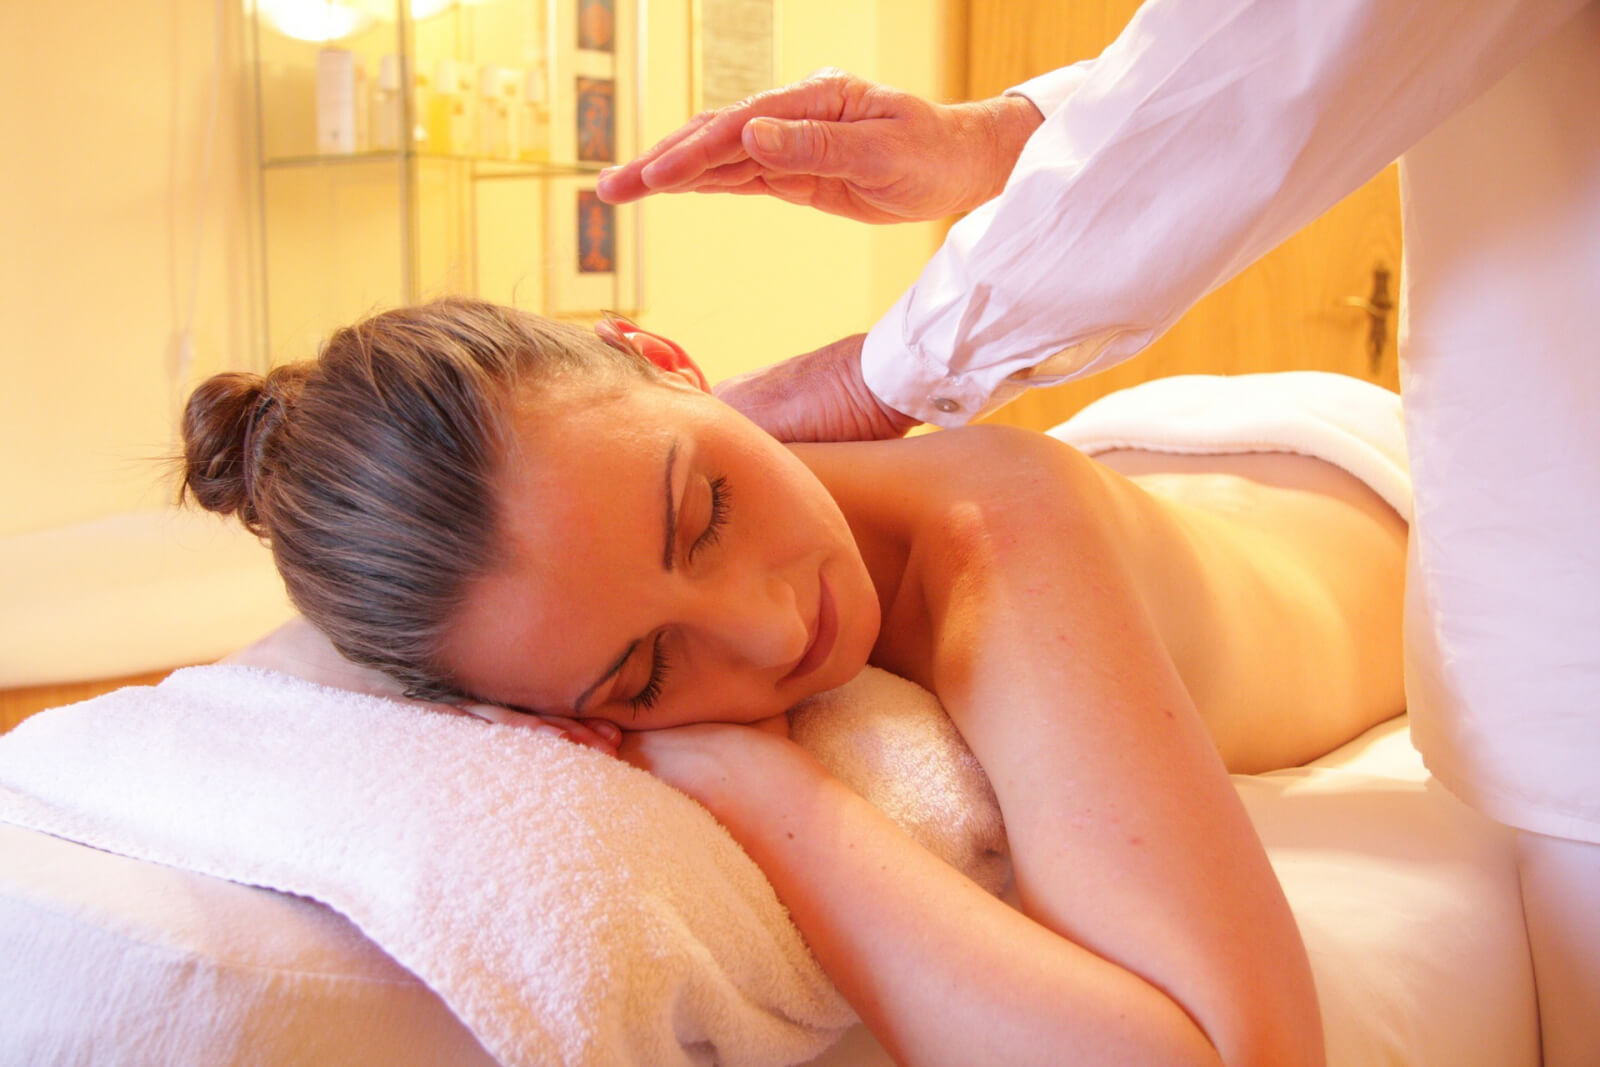 Professional-skin-care-range-abloomnova.net_-1600x1067 Professional skin care range for beauty therapists